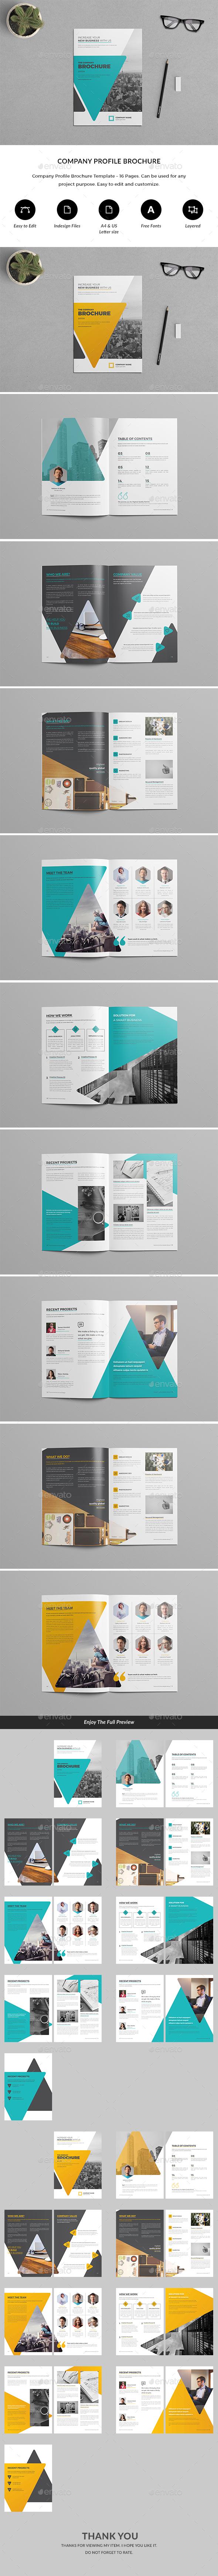 Company Profile Brochure Template By Nashoaib GraphicRiver - Company profile brochure template